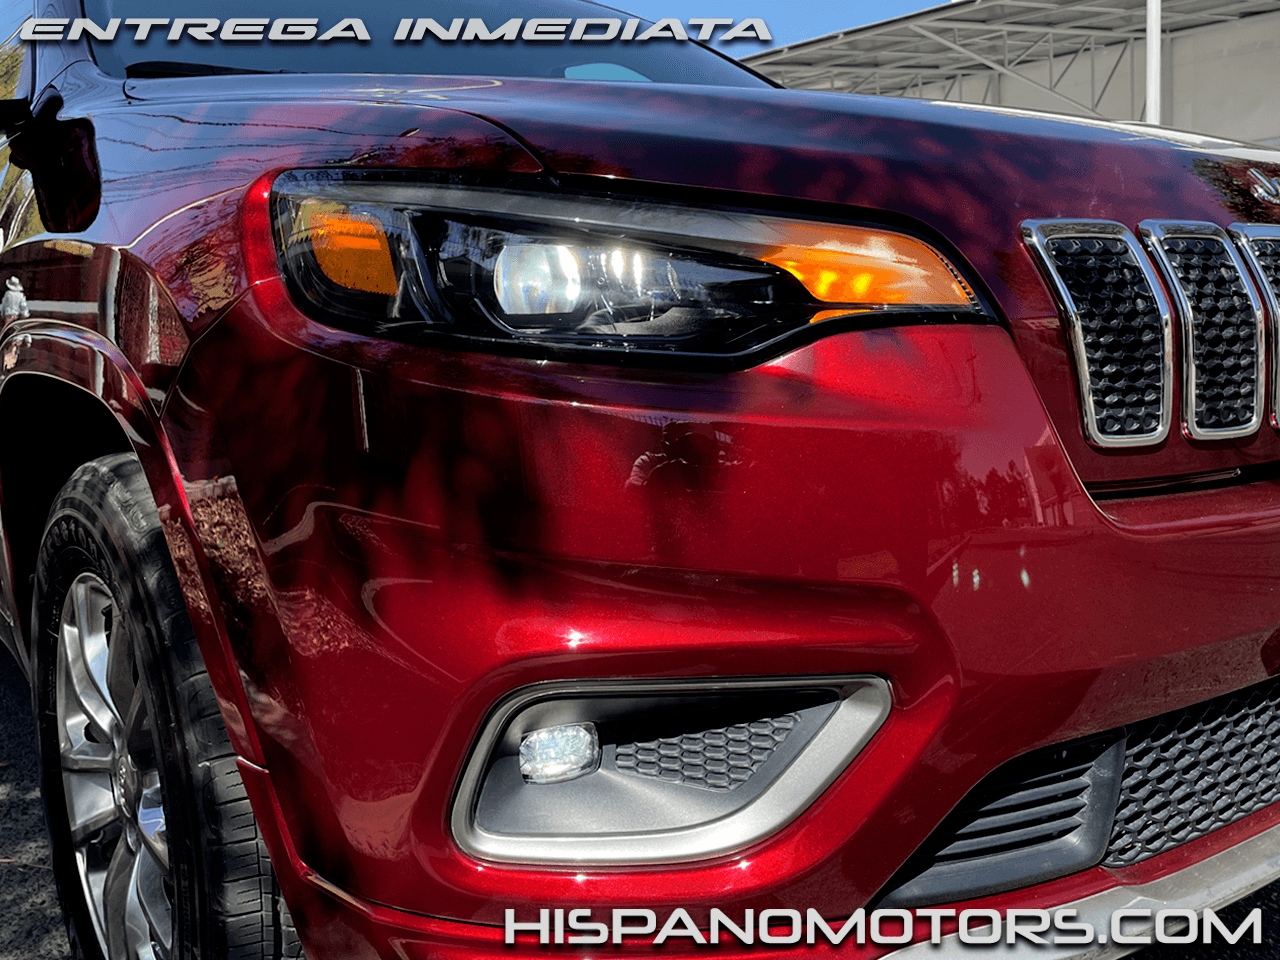 2019 JEEP CHEROKEE 4x4 LATITUDE PLUS  - Foto del auto importado